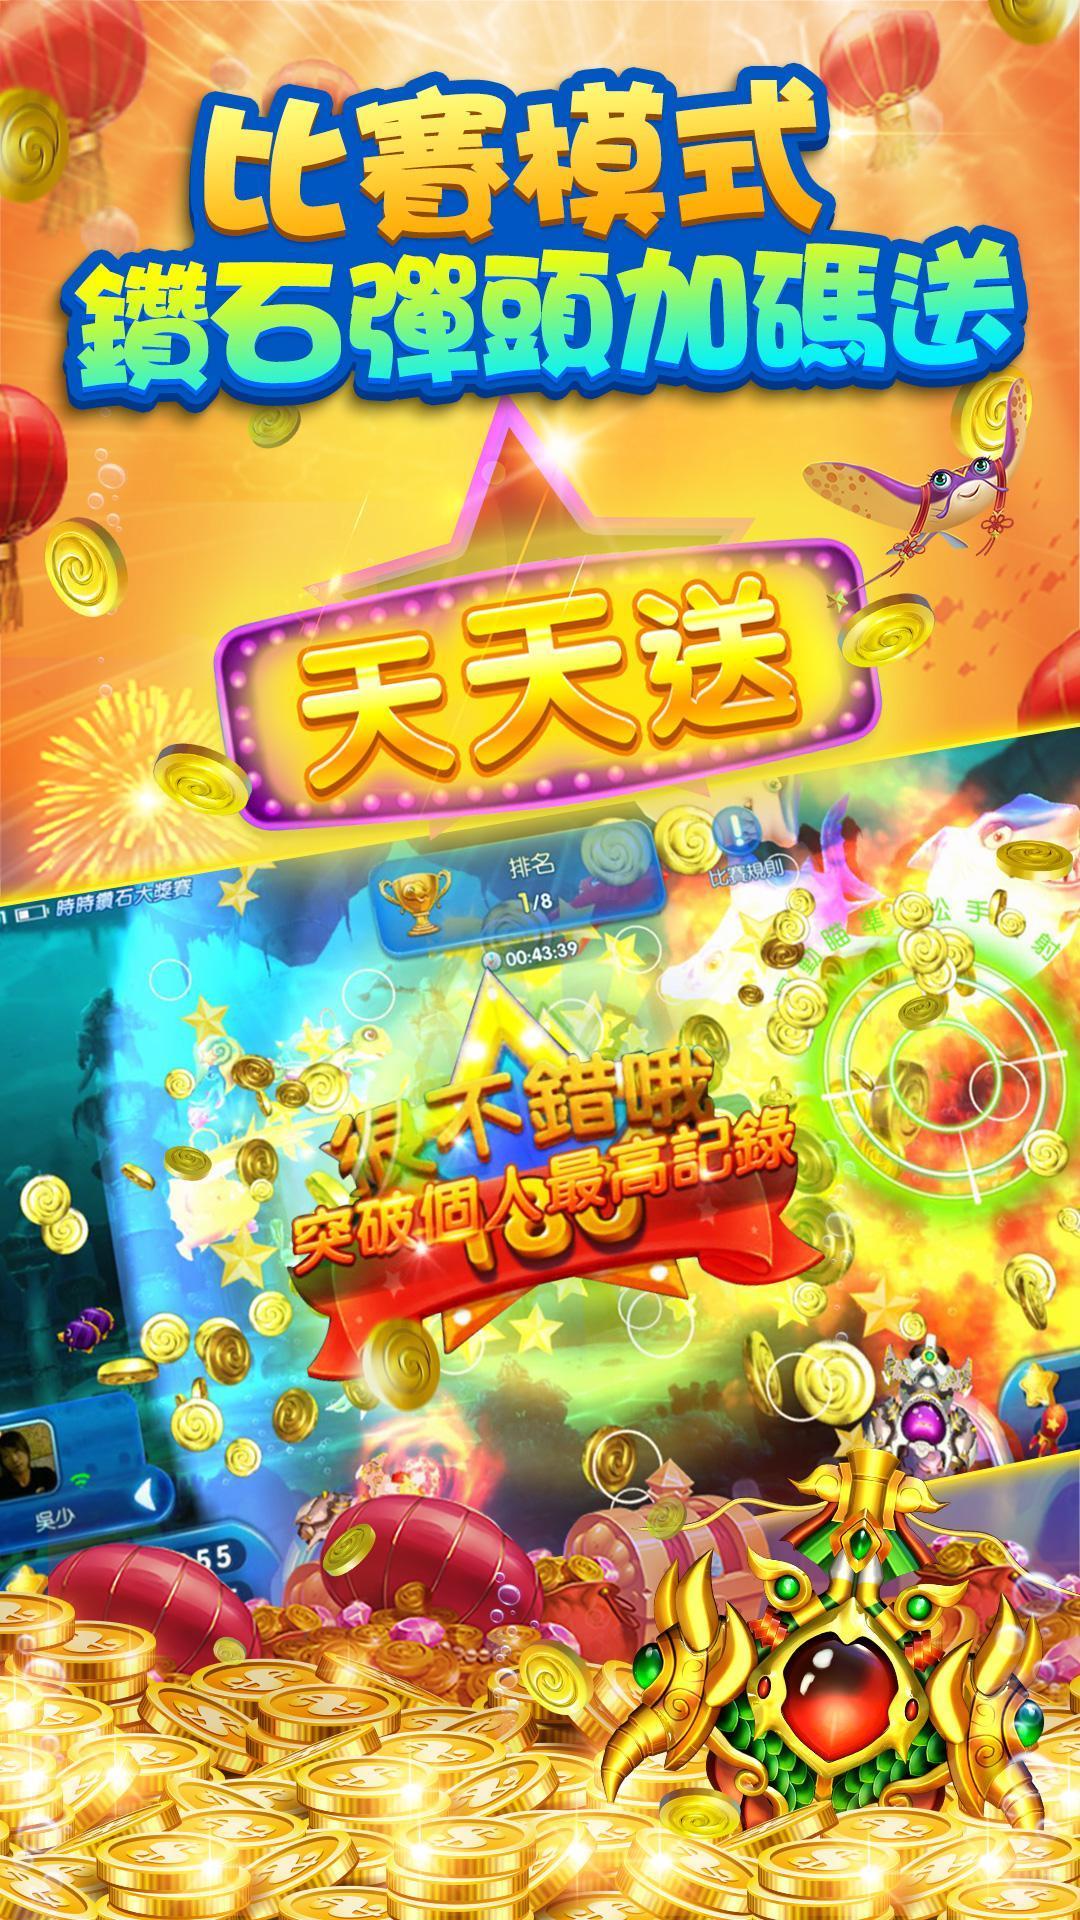 Fish is Coming: Best 3D Arcade 1.16.2 Screenshot 4